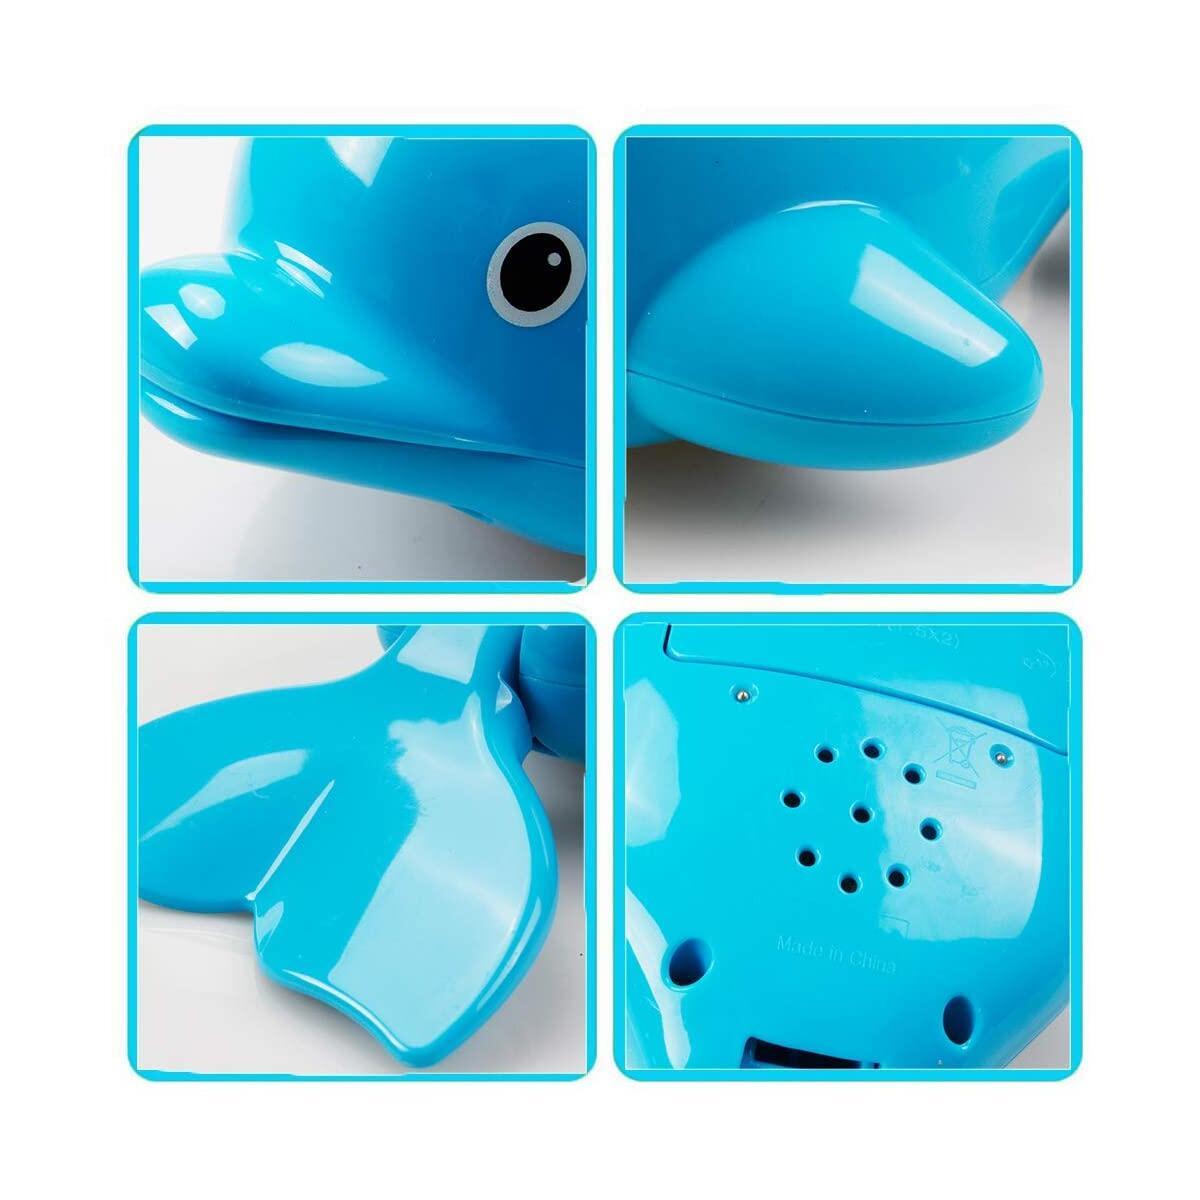 WISHTIME Bathtub Toys Pool Toys for Kids Electric Spray Water Floating Dolphin Fountain Bath Toys Bathtime Tub Toys Fun Shower Time for Toddlers Kids Boys Girls